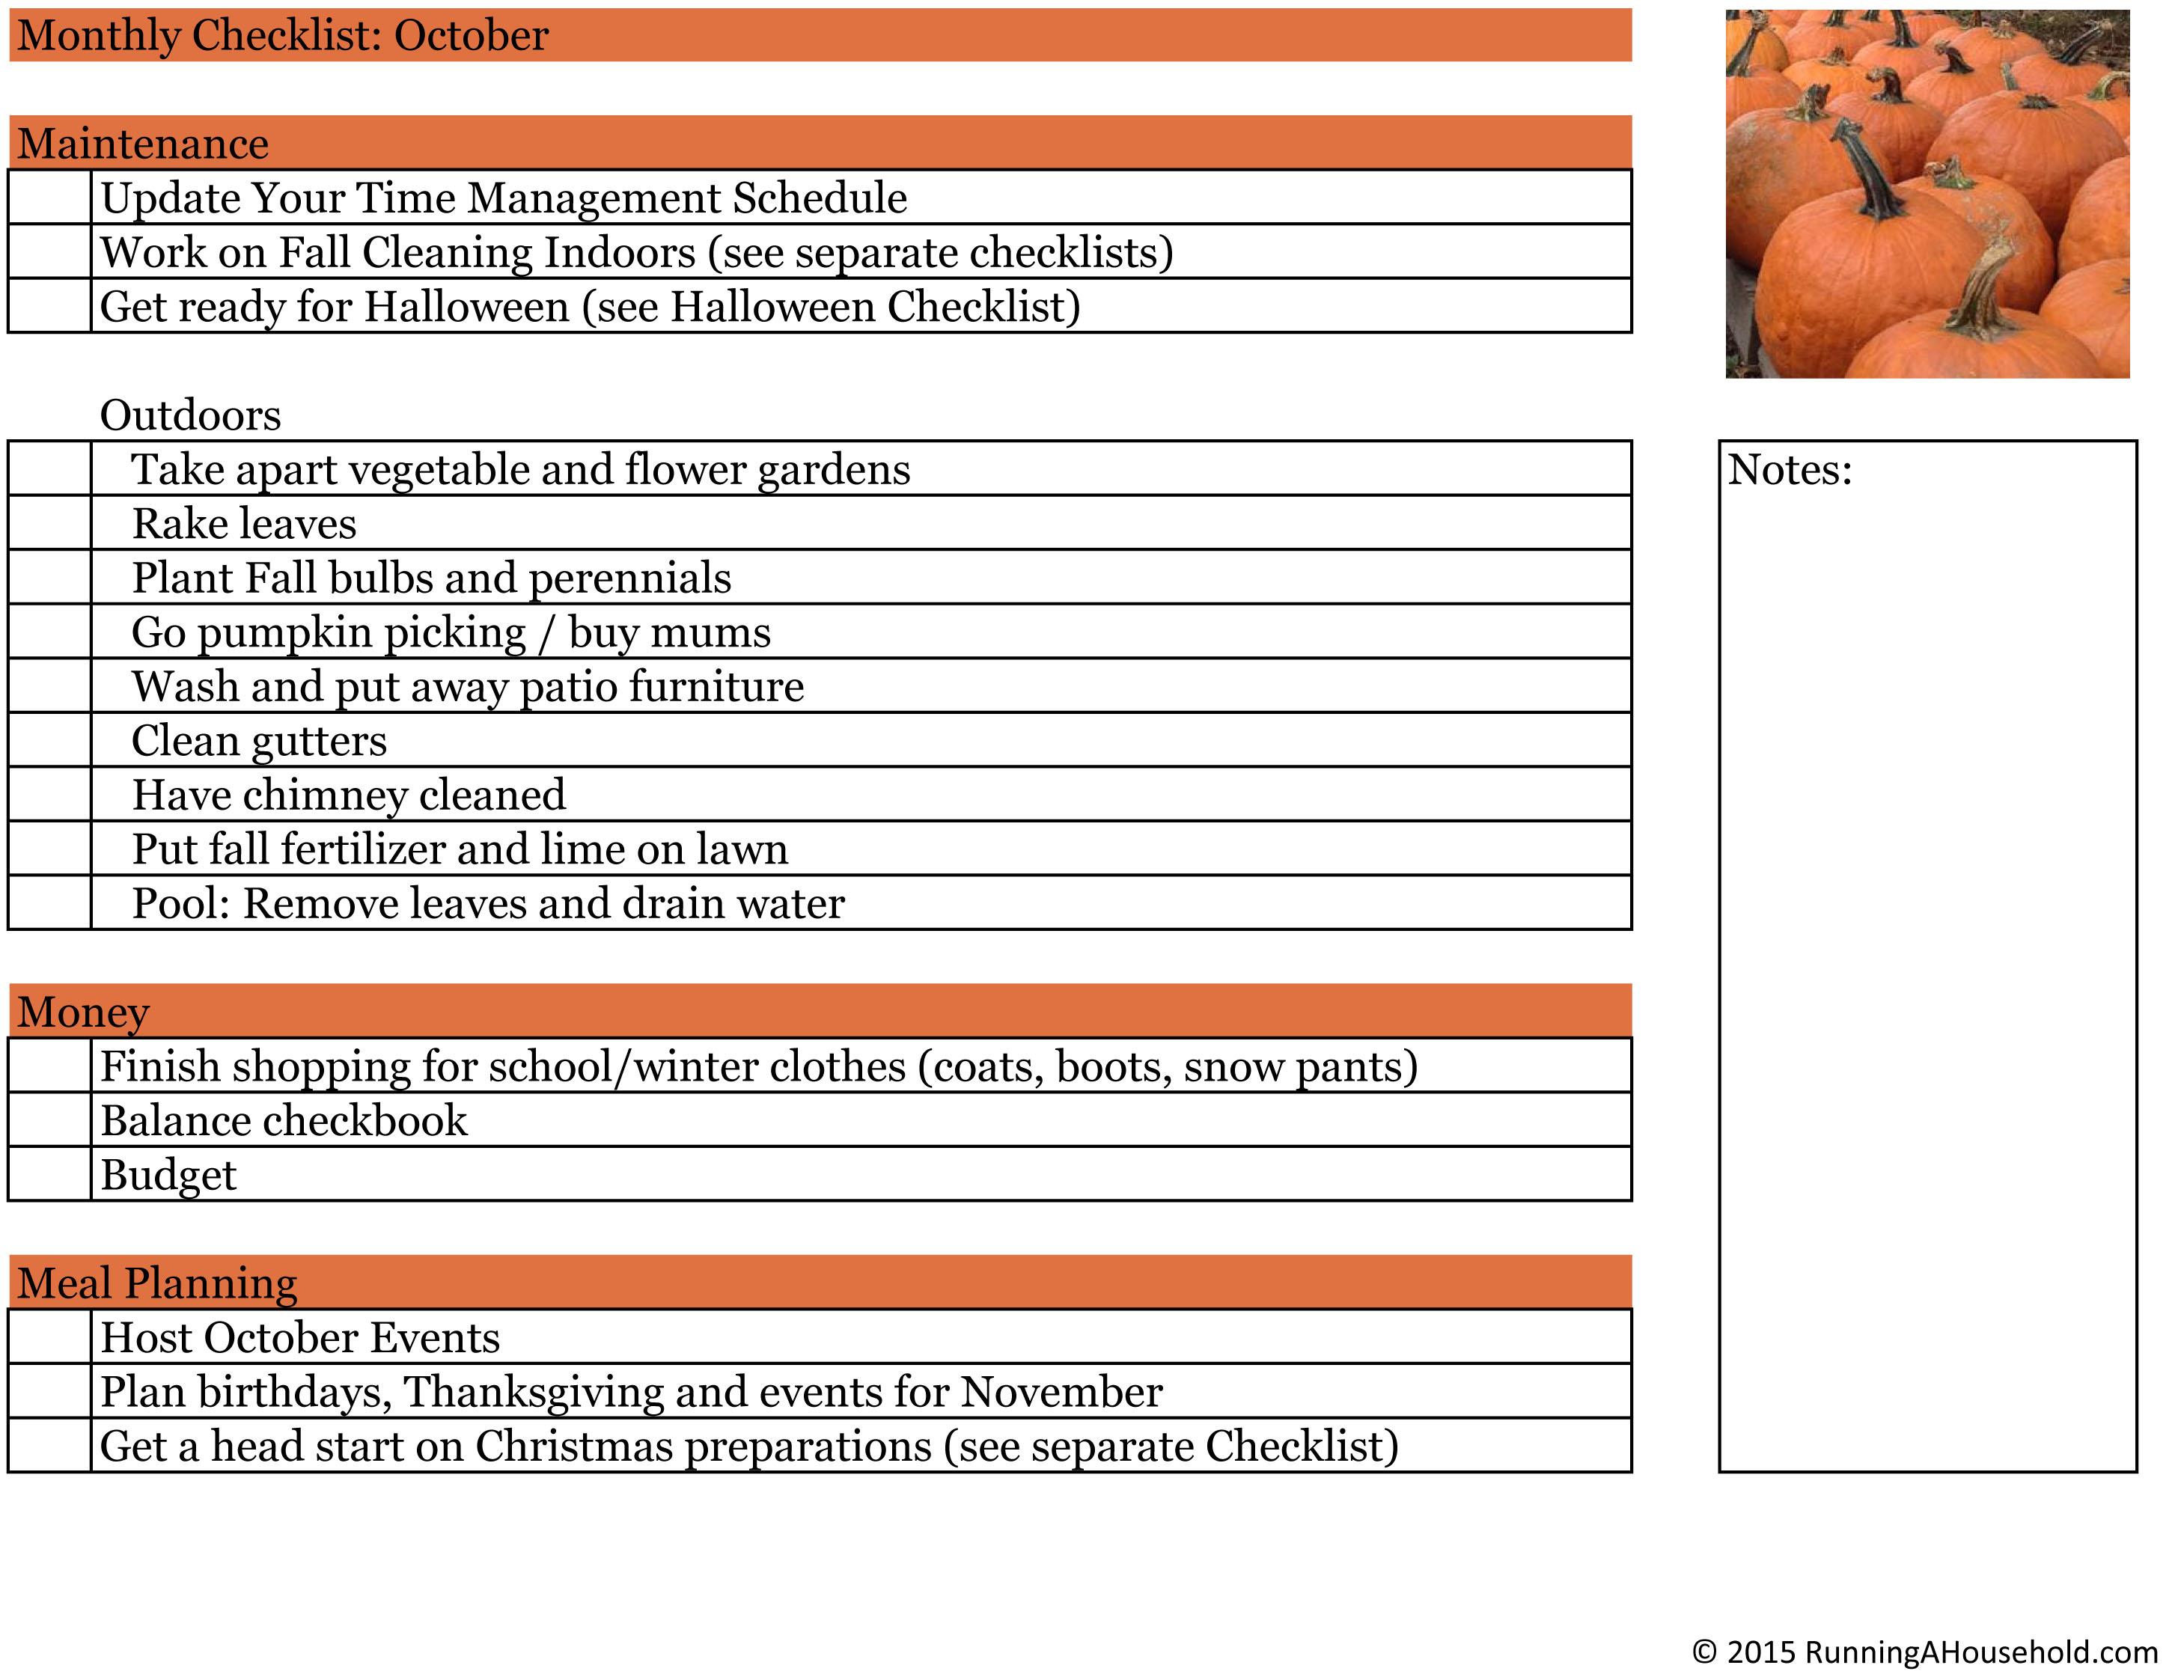 Household Checklist For October Running A Household